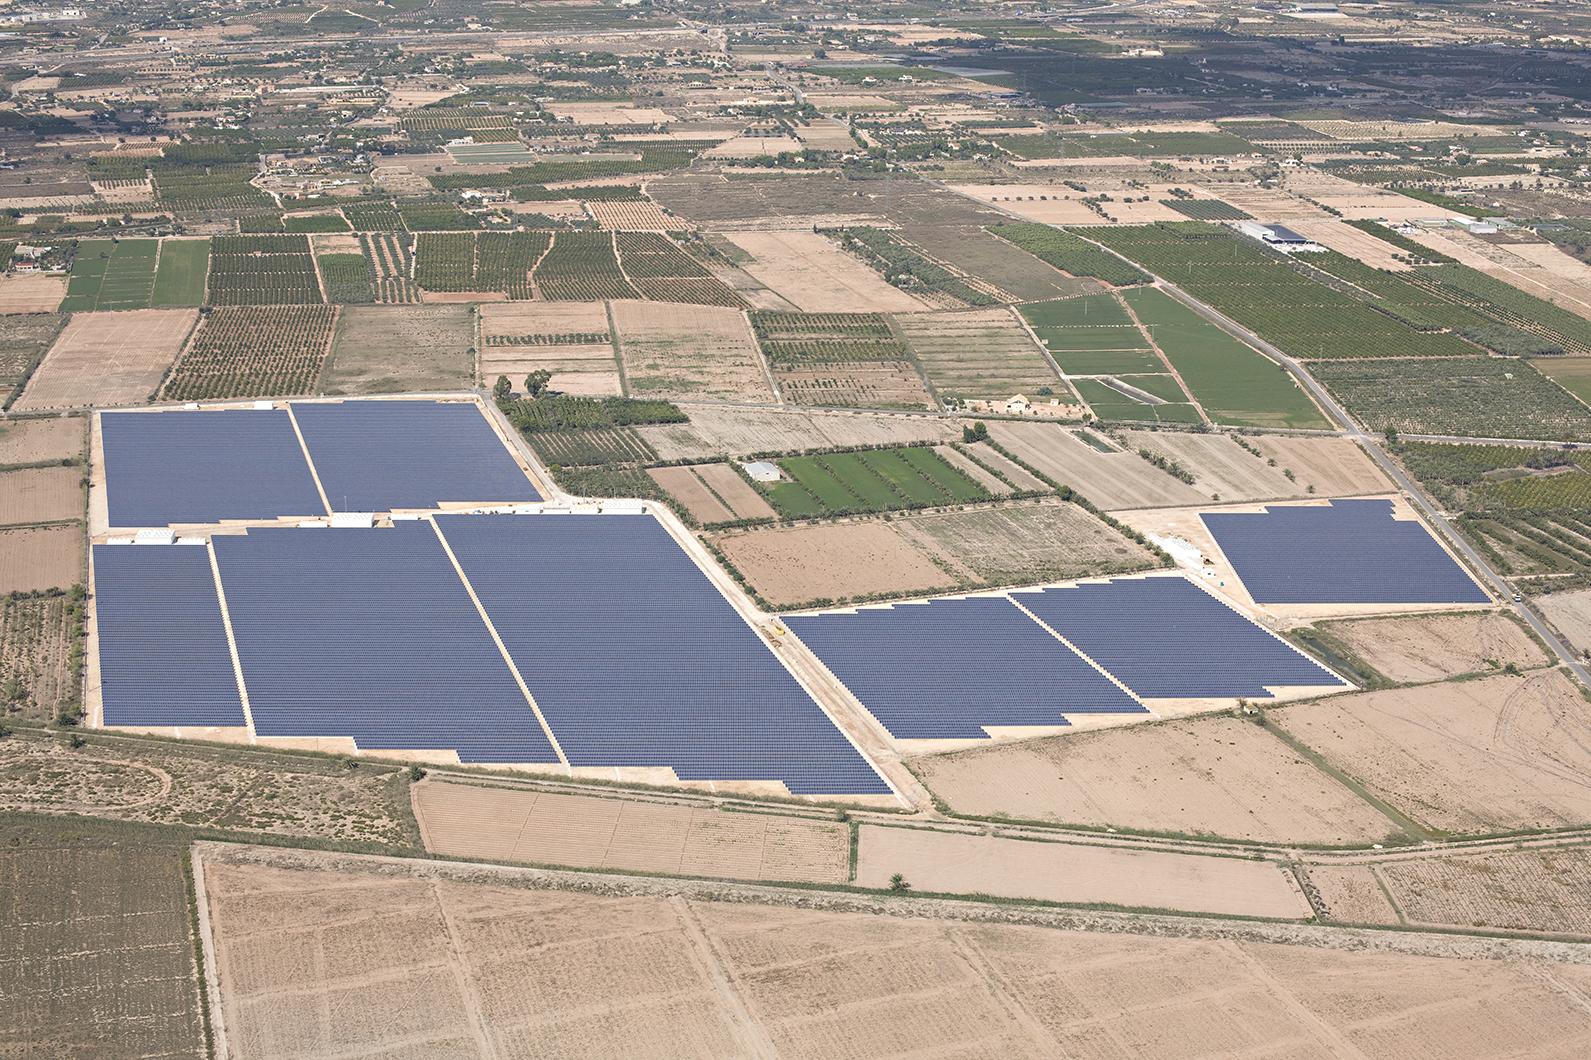 Crevillent: Spain's first solar community